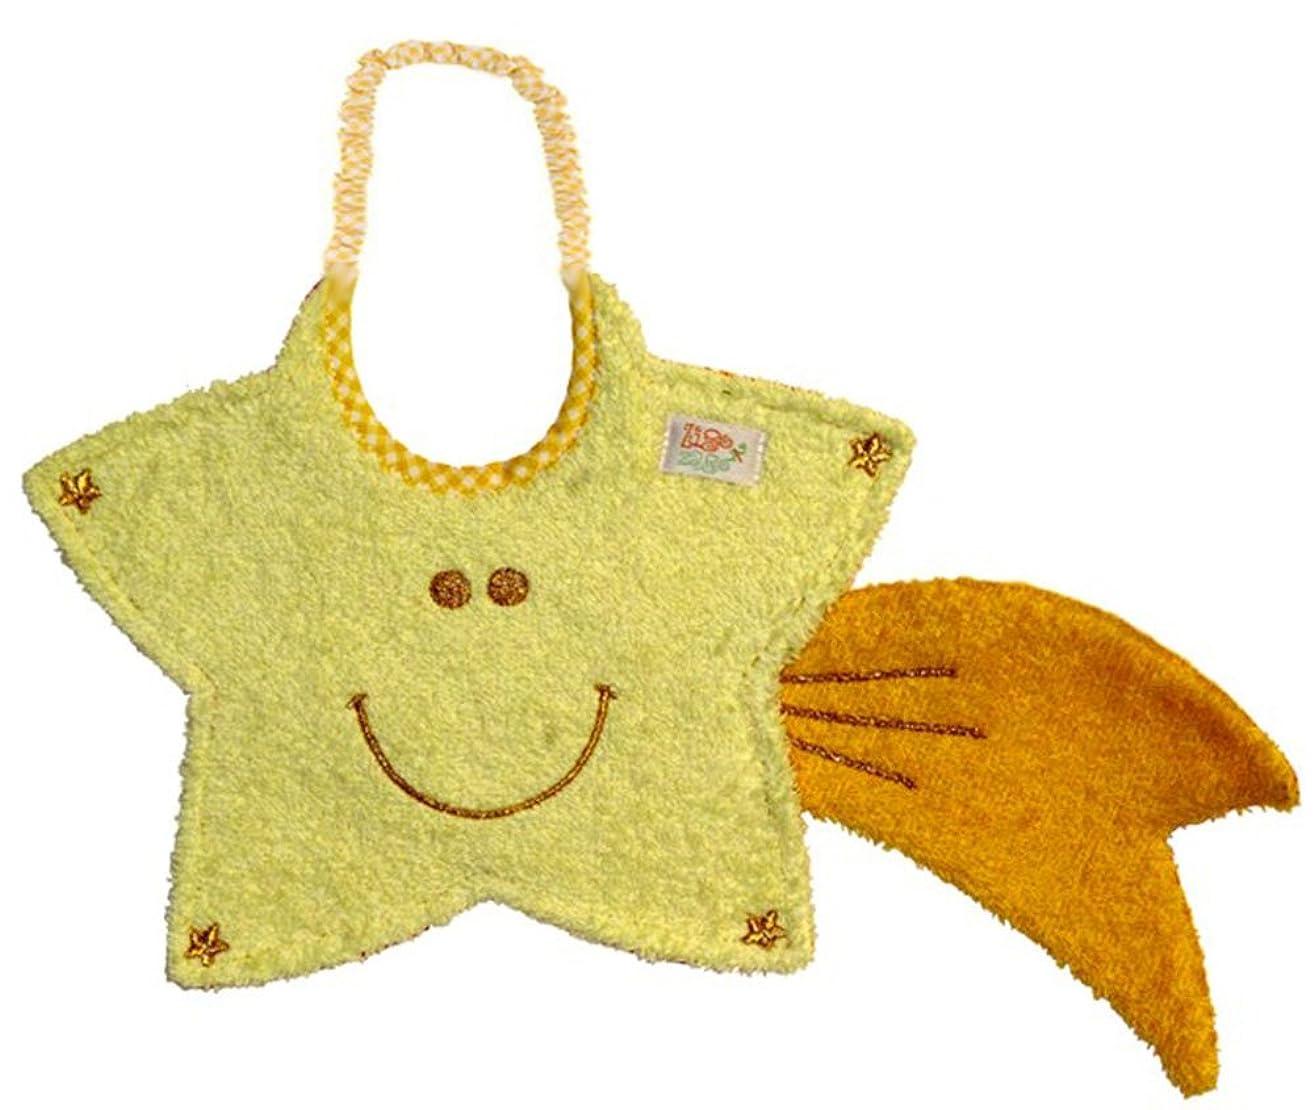 Zigozago - Baby Bib Comet Star; Tie: Elastic; One Size - Christmas